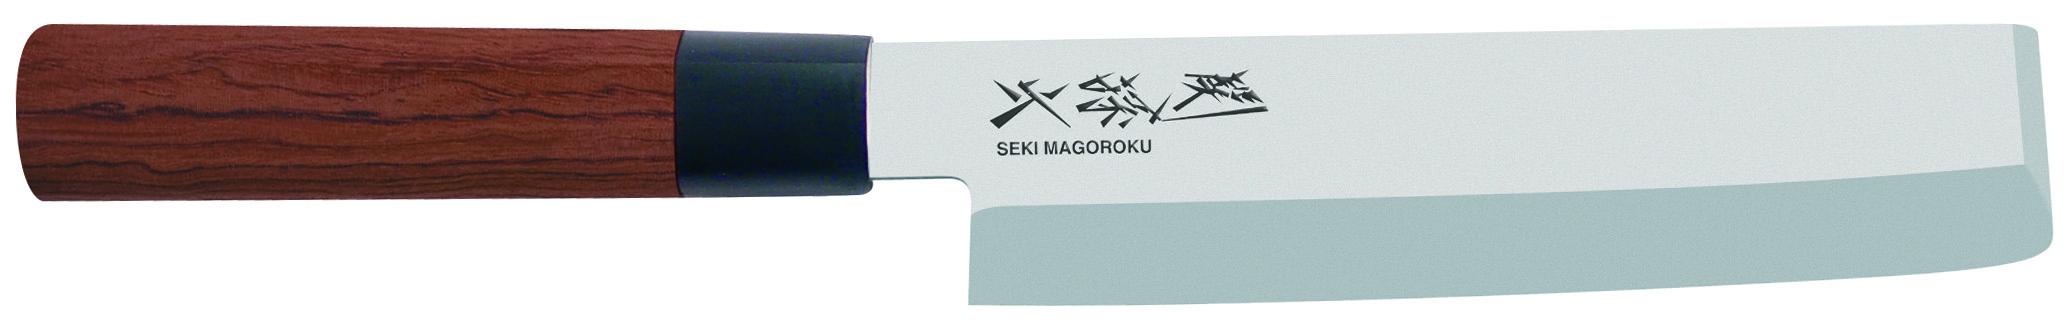 Kuchynský nôž Seki Magoroku Nakiri MGR-165N